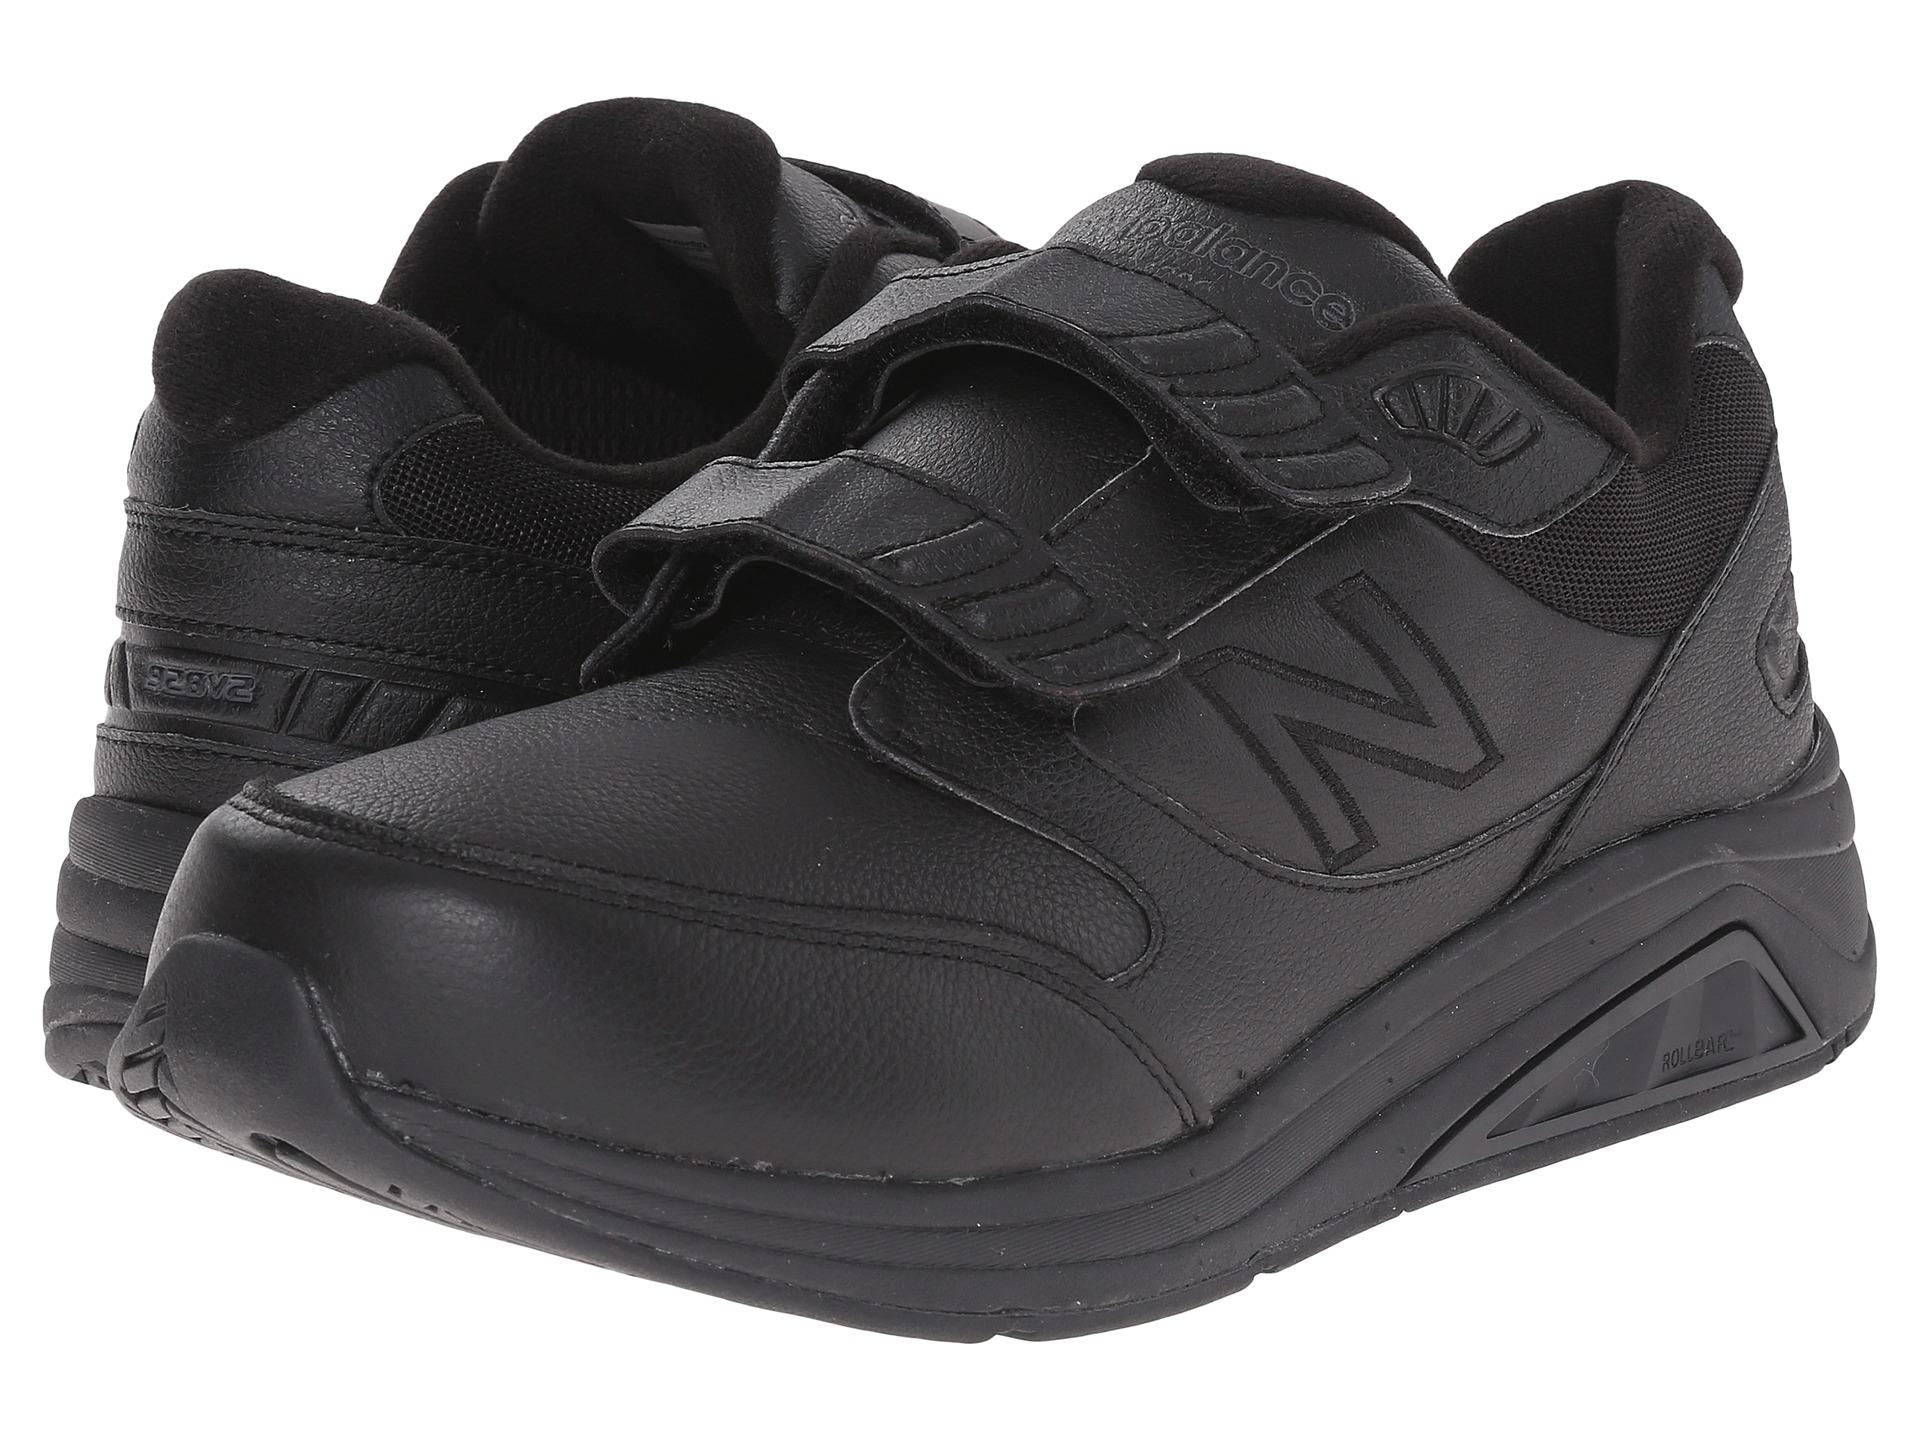 Womens New Balance Walking Shoes Uk